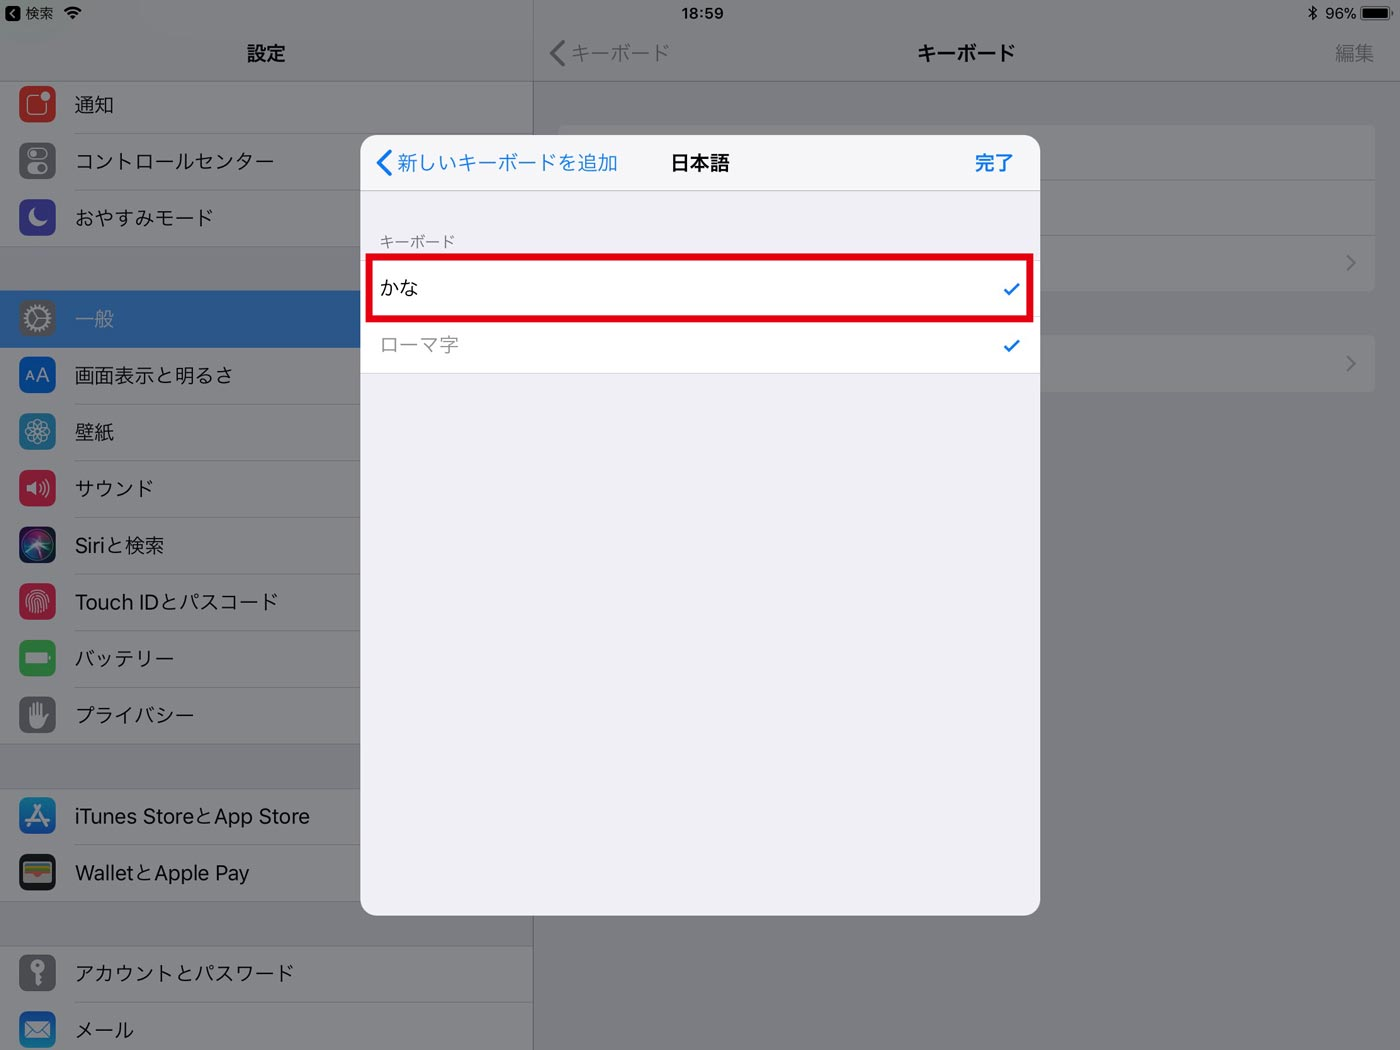 iPad 日本語フリック入力